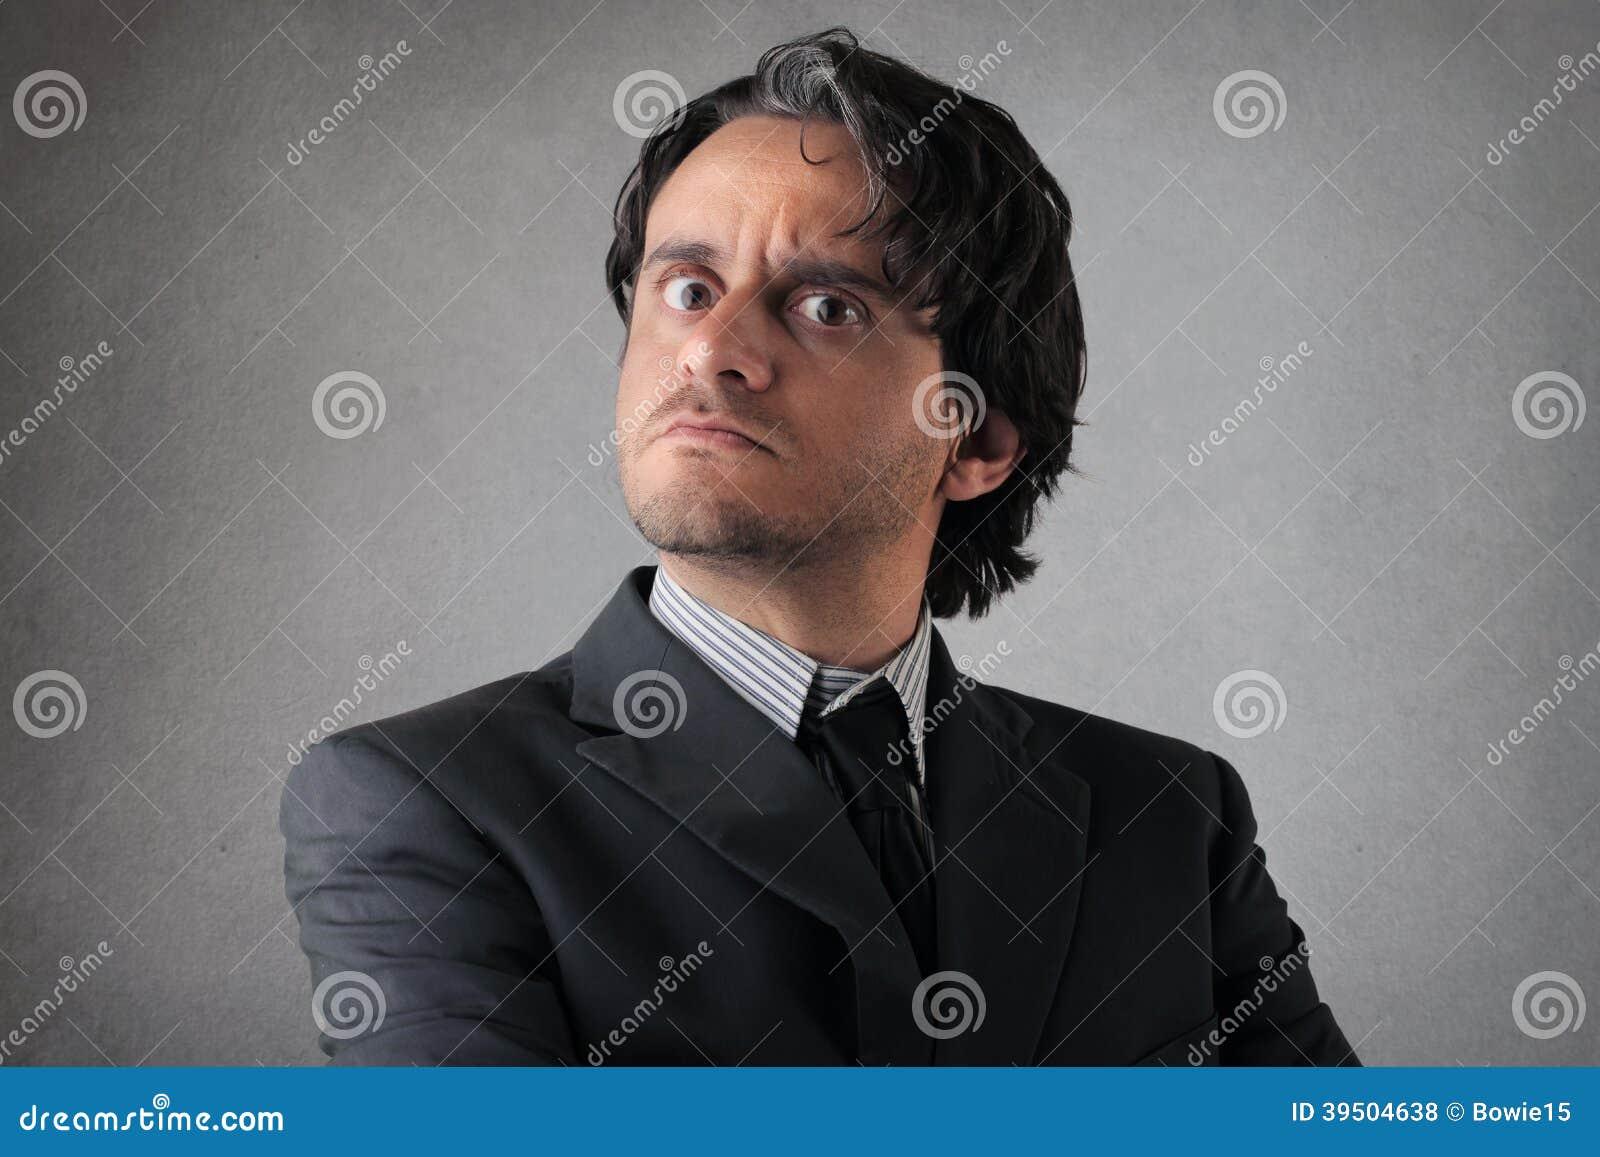 Suspicious young businessman